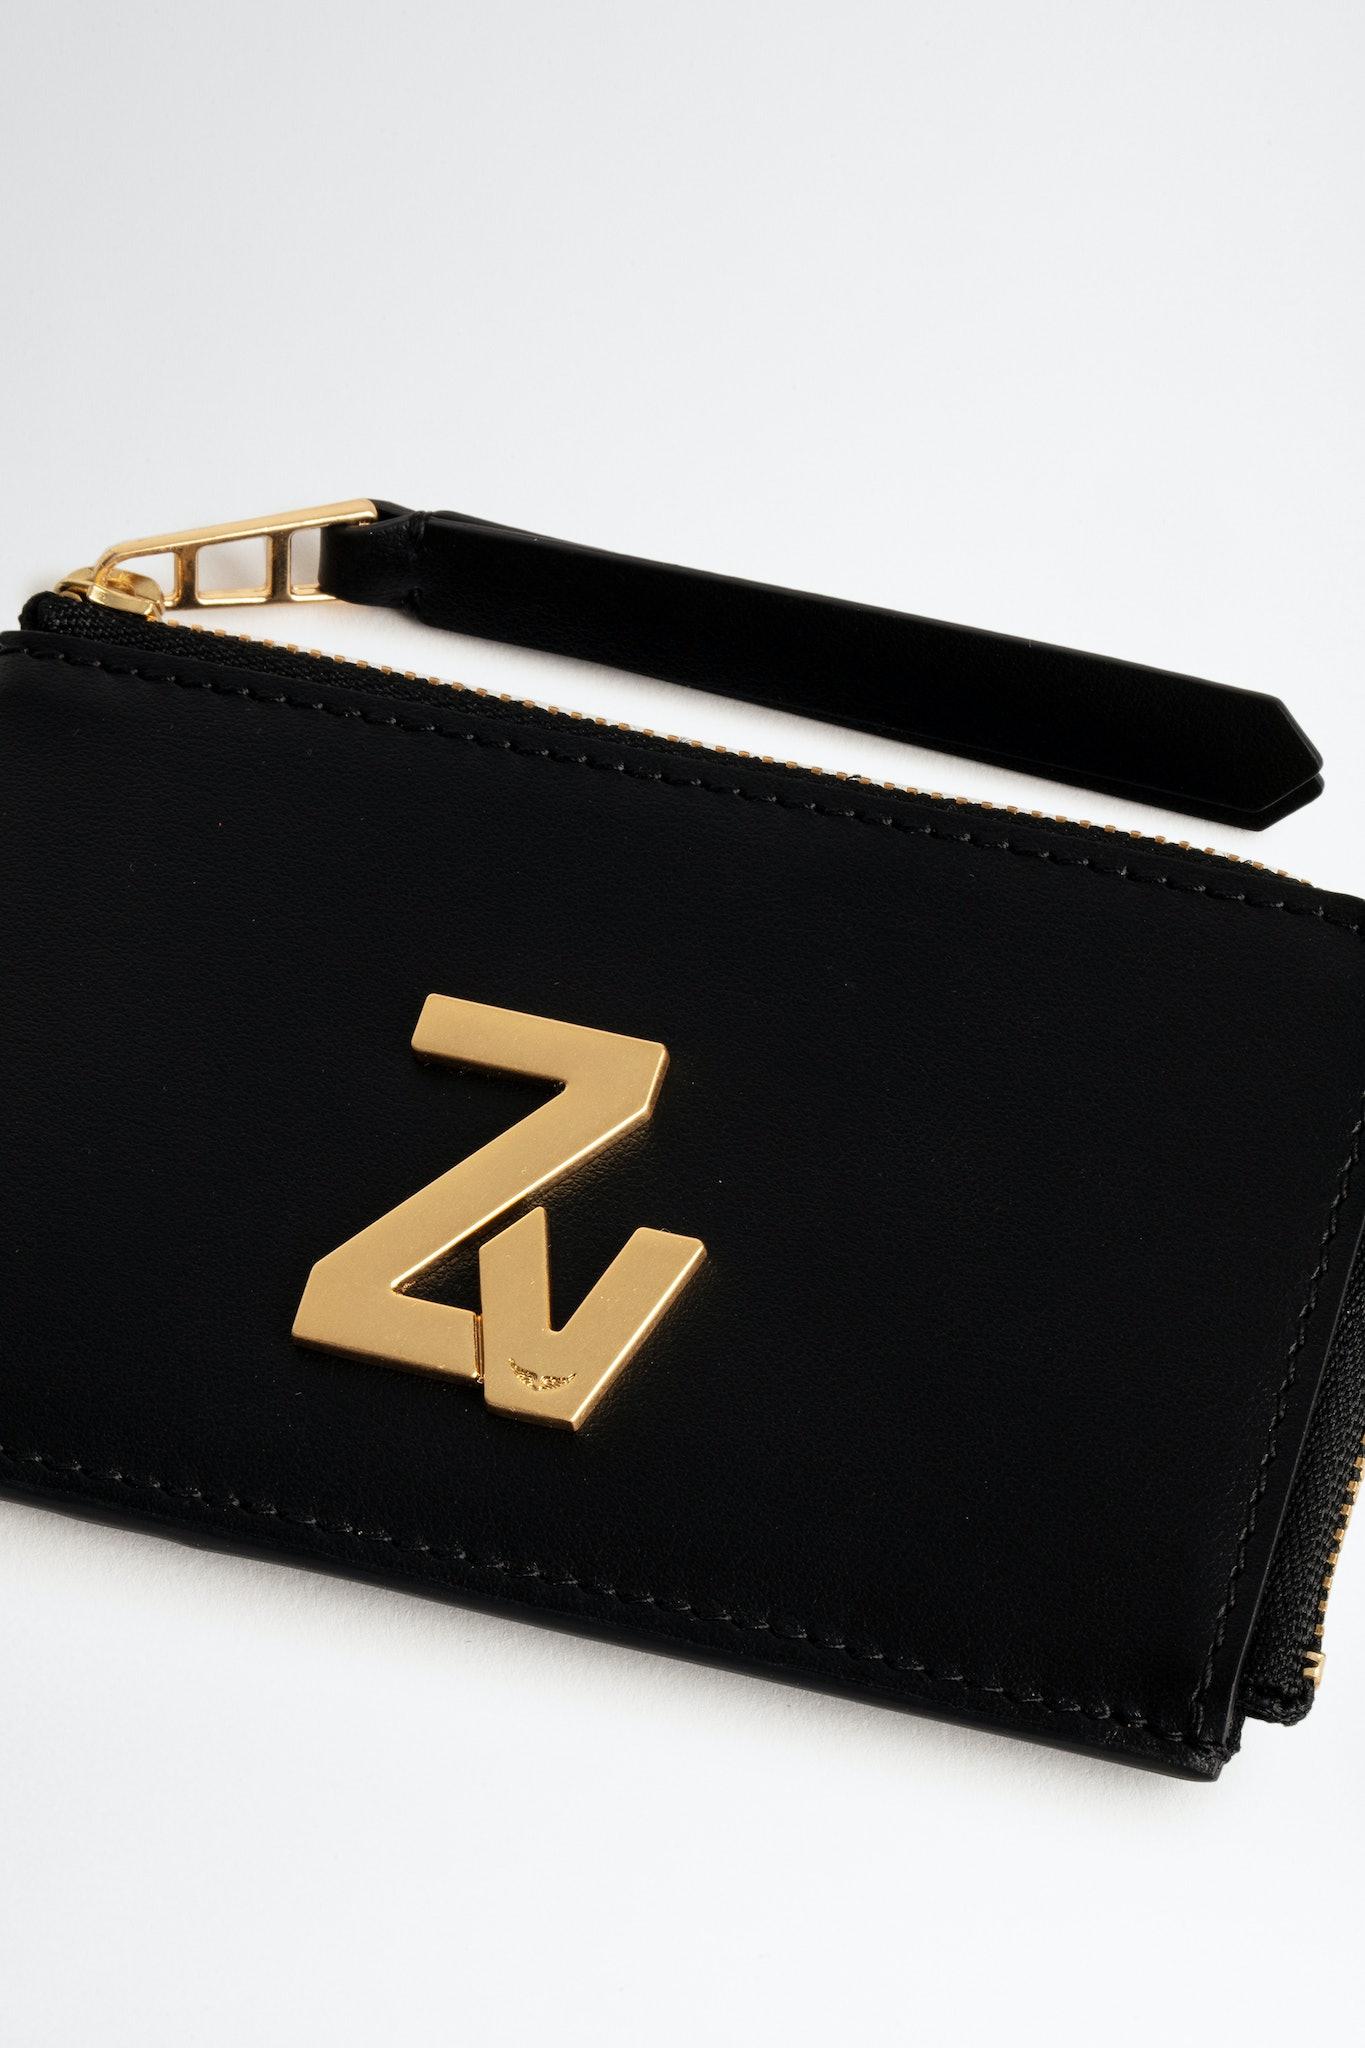 Zv Initiale The Medium Card Holder